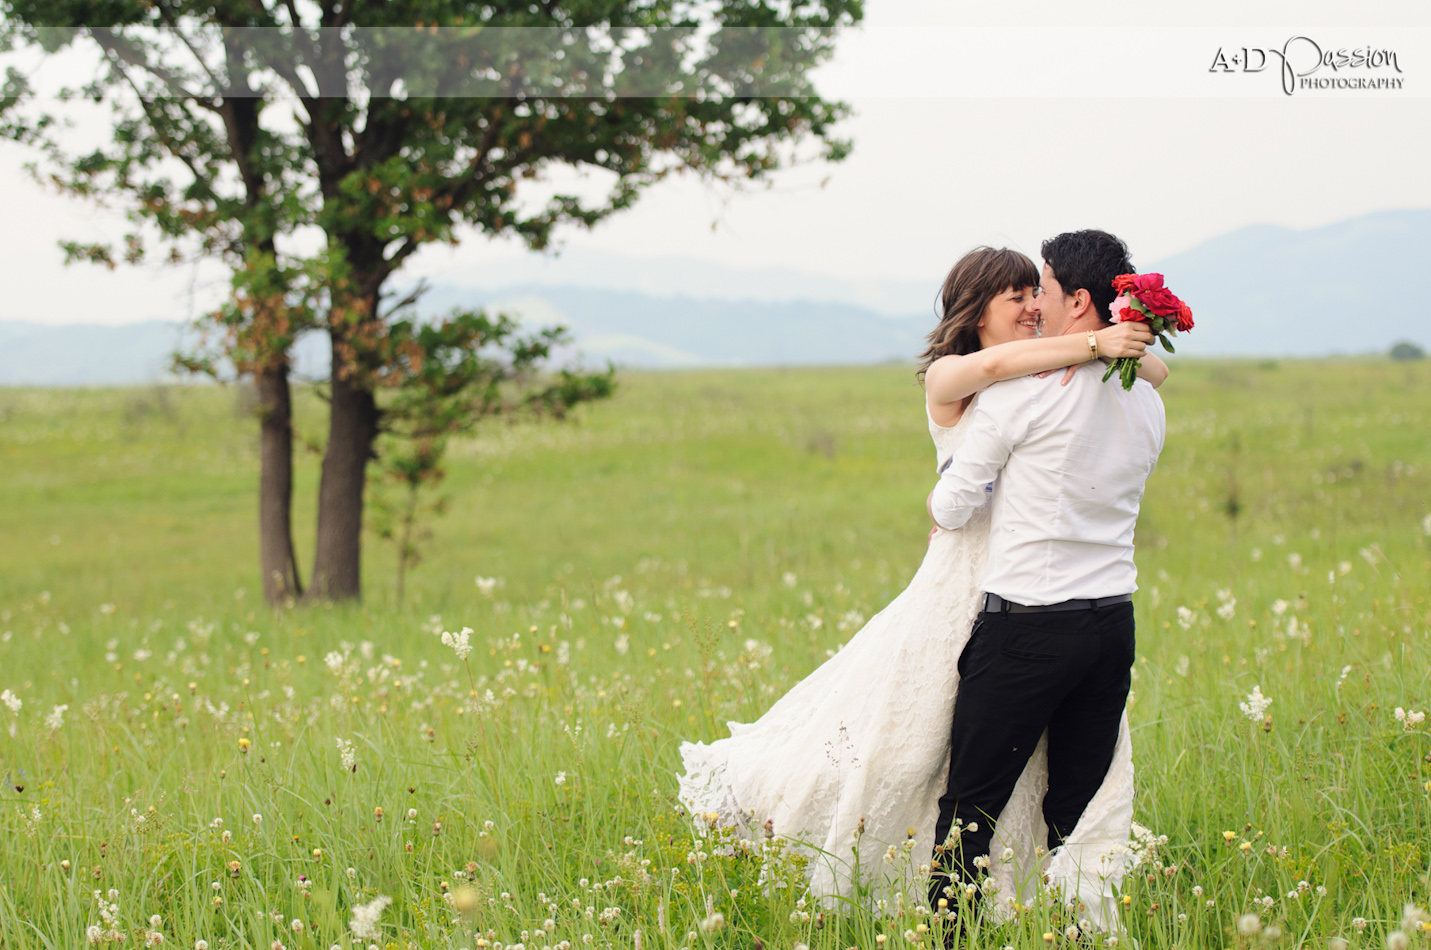 AD Passion Photography | 07042012_fotograf-profesionist-nunta_after-wedding_carmen-si-costi_0021 | Adelin, Dida, fotograf profesionist, fotograf de nunta, fotografie de nunta, fotograf Timisoara, fotograf Craiova, fotograf Bucuresti, fotograf Arad, nunta Timisoara, nunta Arad, nunta Bucuresti, nunta Craiova